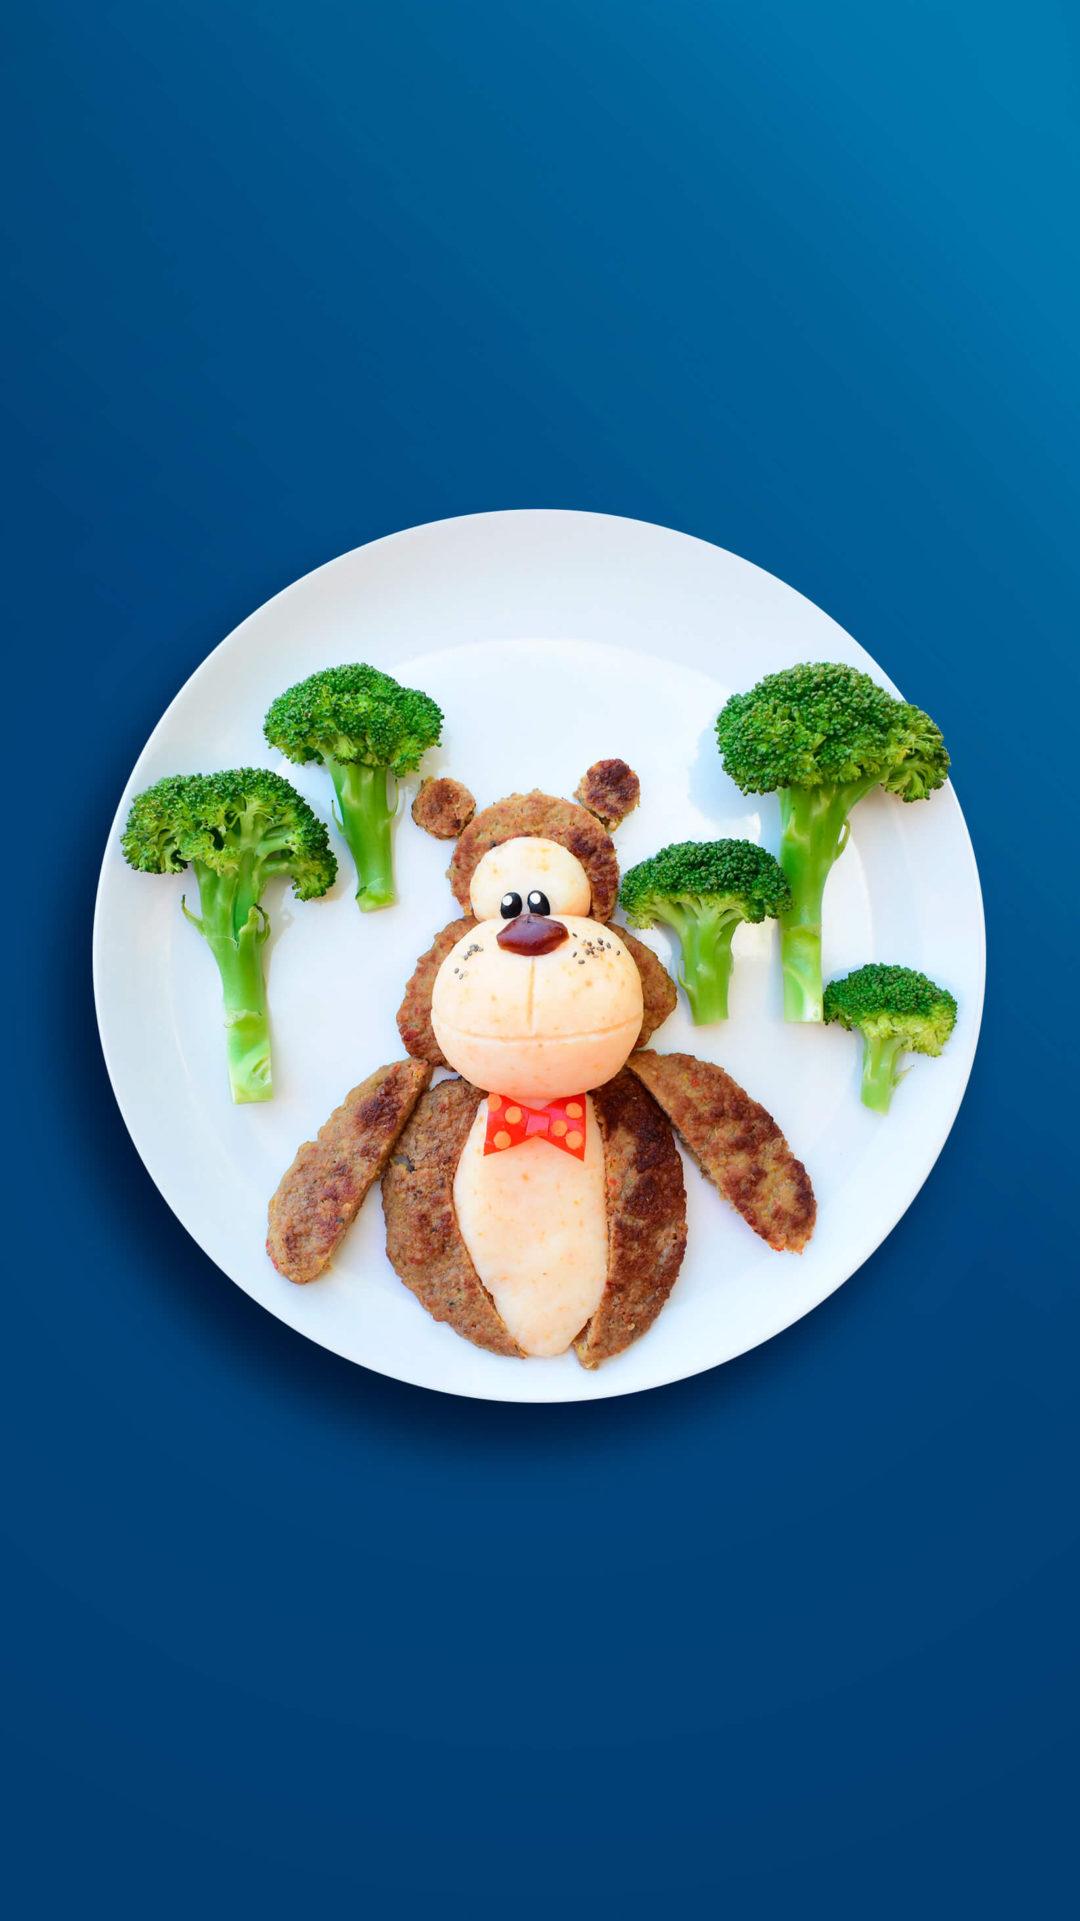 Braunbär im Wald – Schnitzel mit Kartoffelpüree und Brokkoli